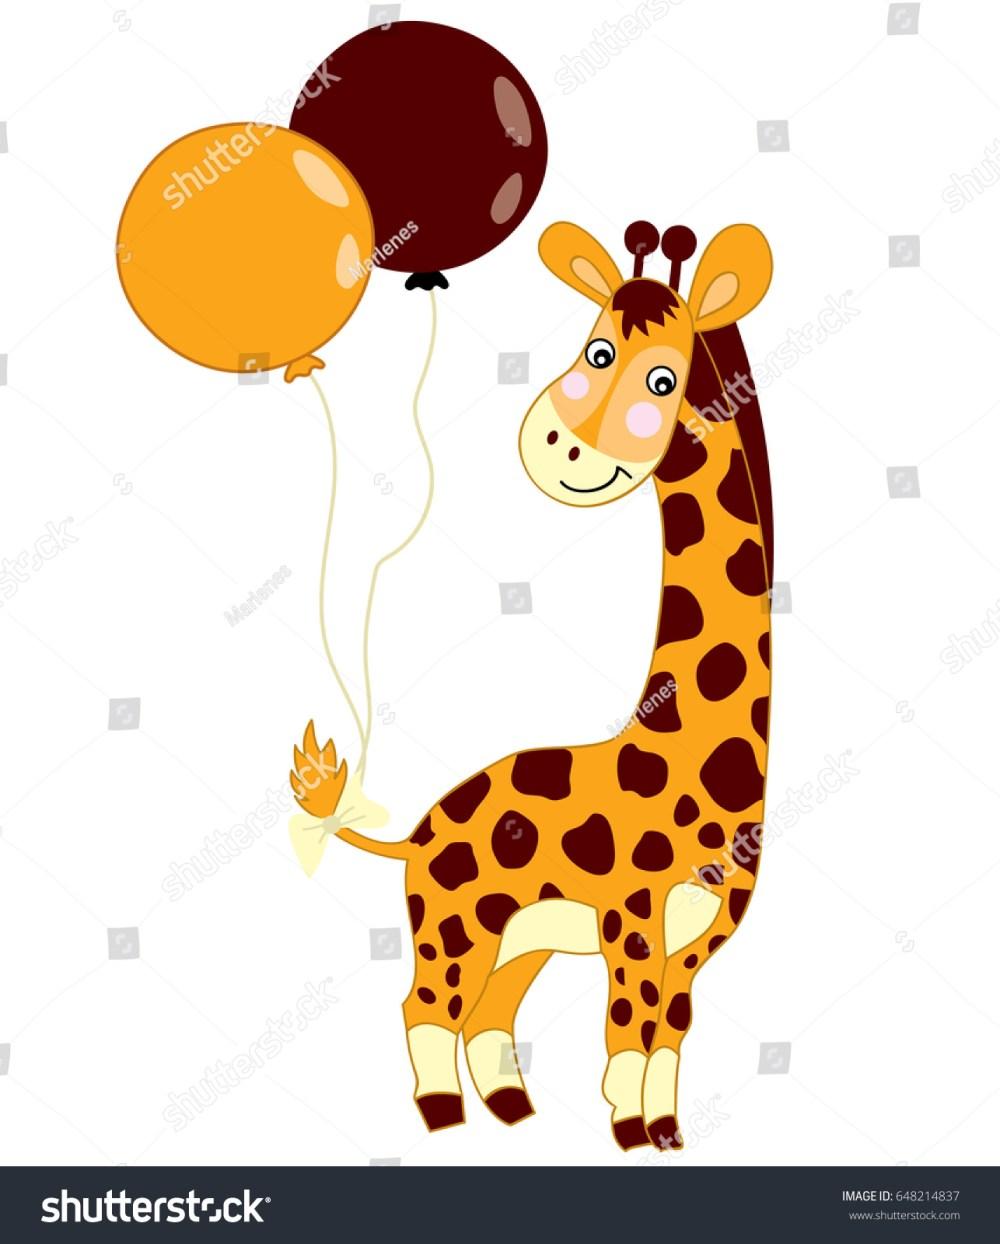 medium resolution of vector cute baby giraffe with balloons on white background giraffe clipart giraffe vector illustration